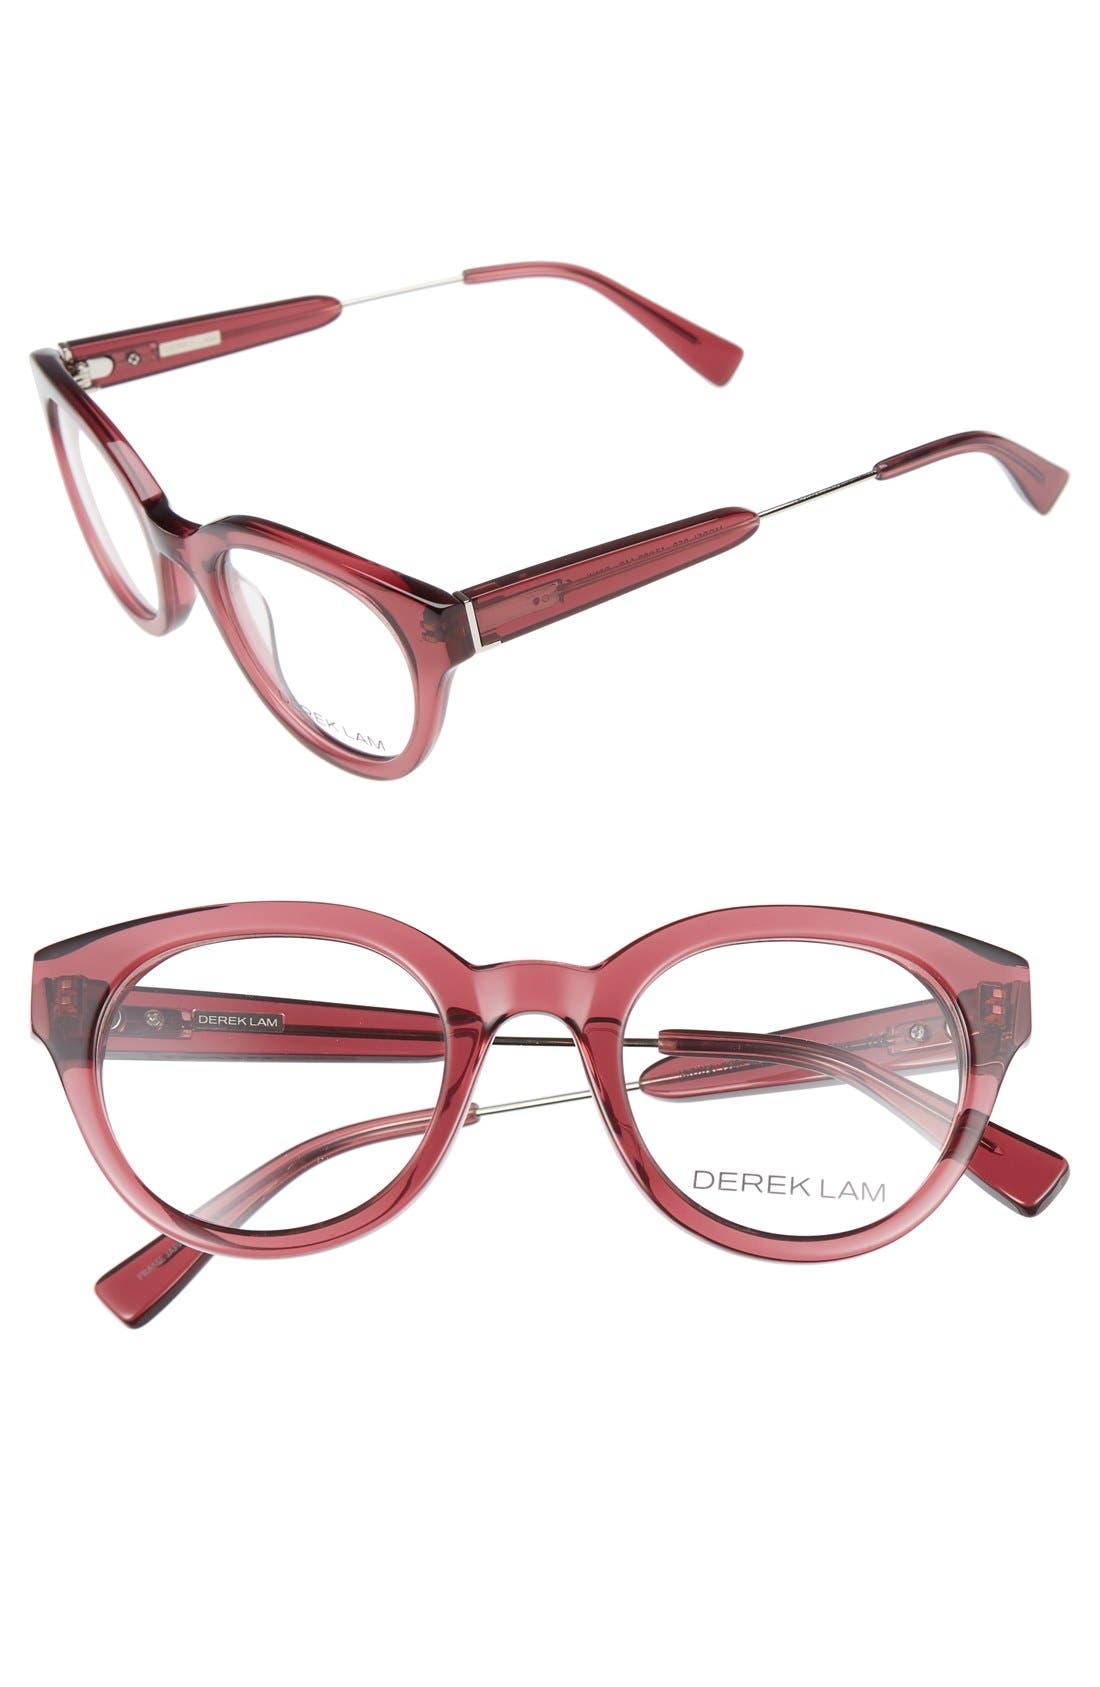 Derek Lam 47mm Optical Glasses